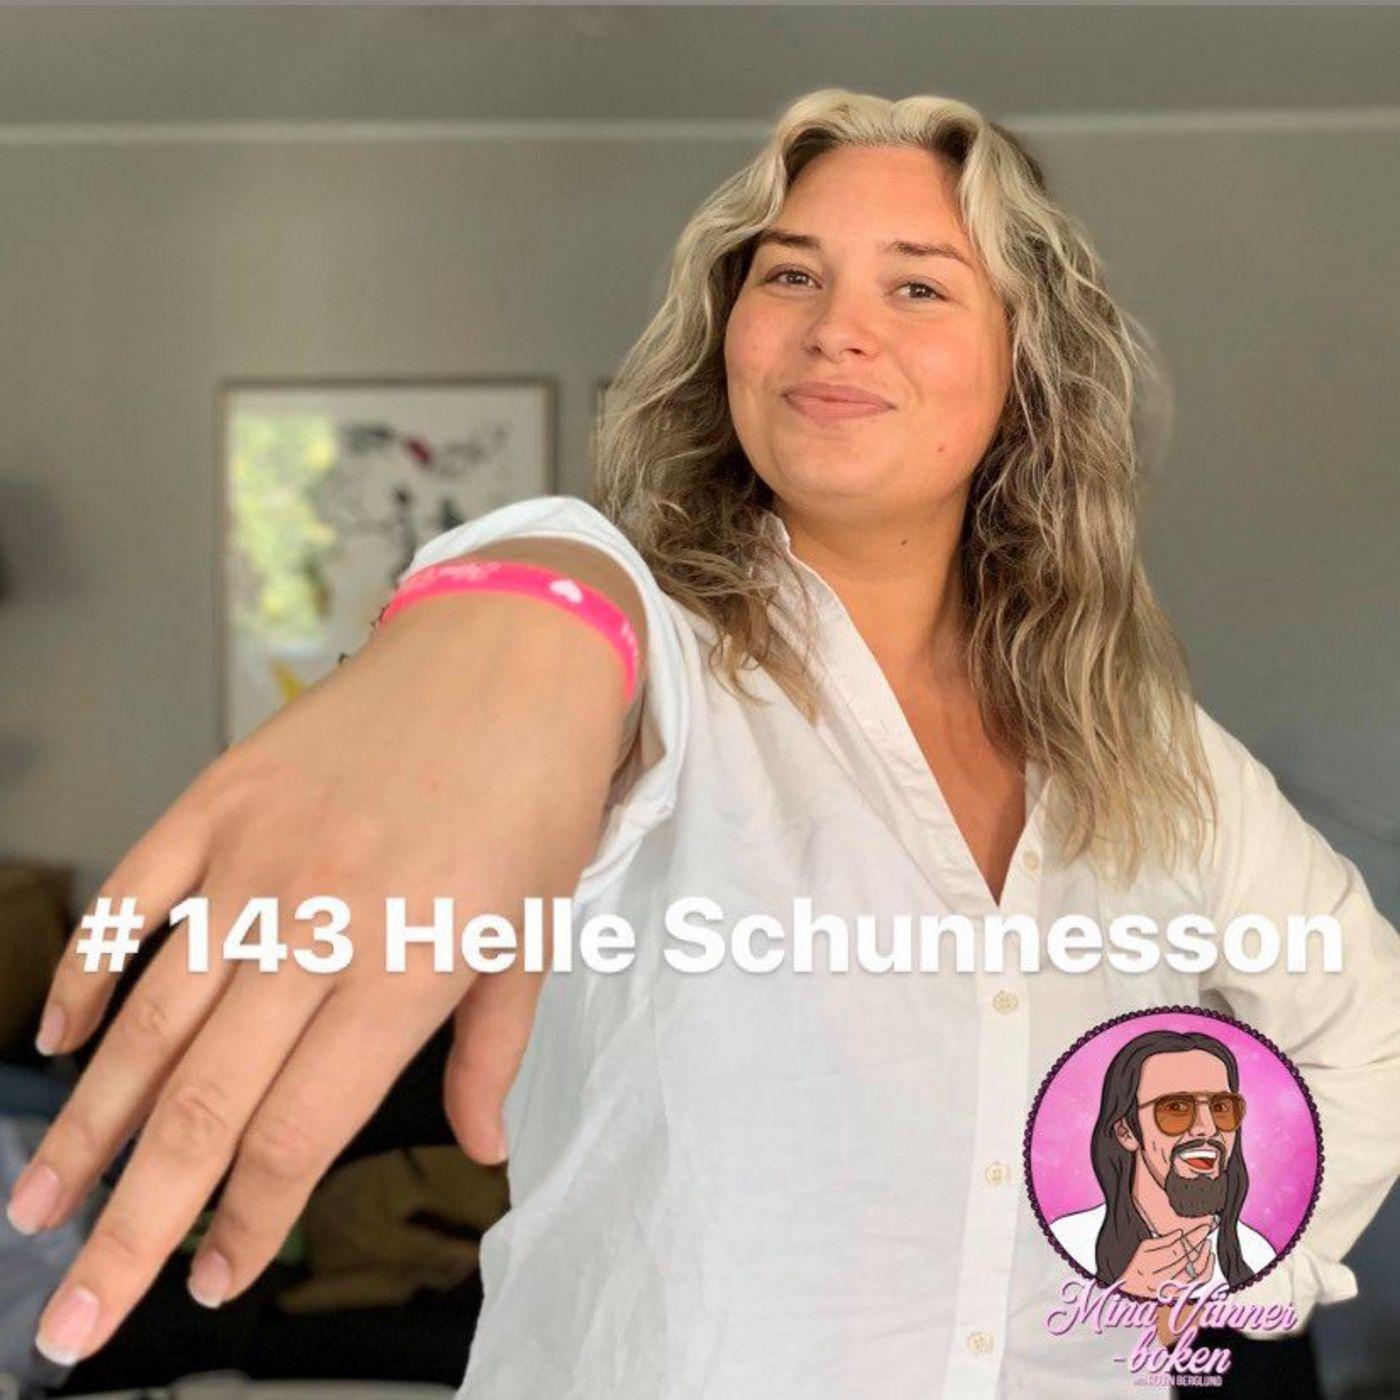 MVB #143 Helle Schunnesson